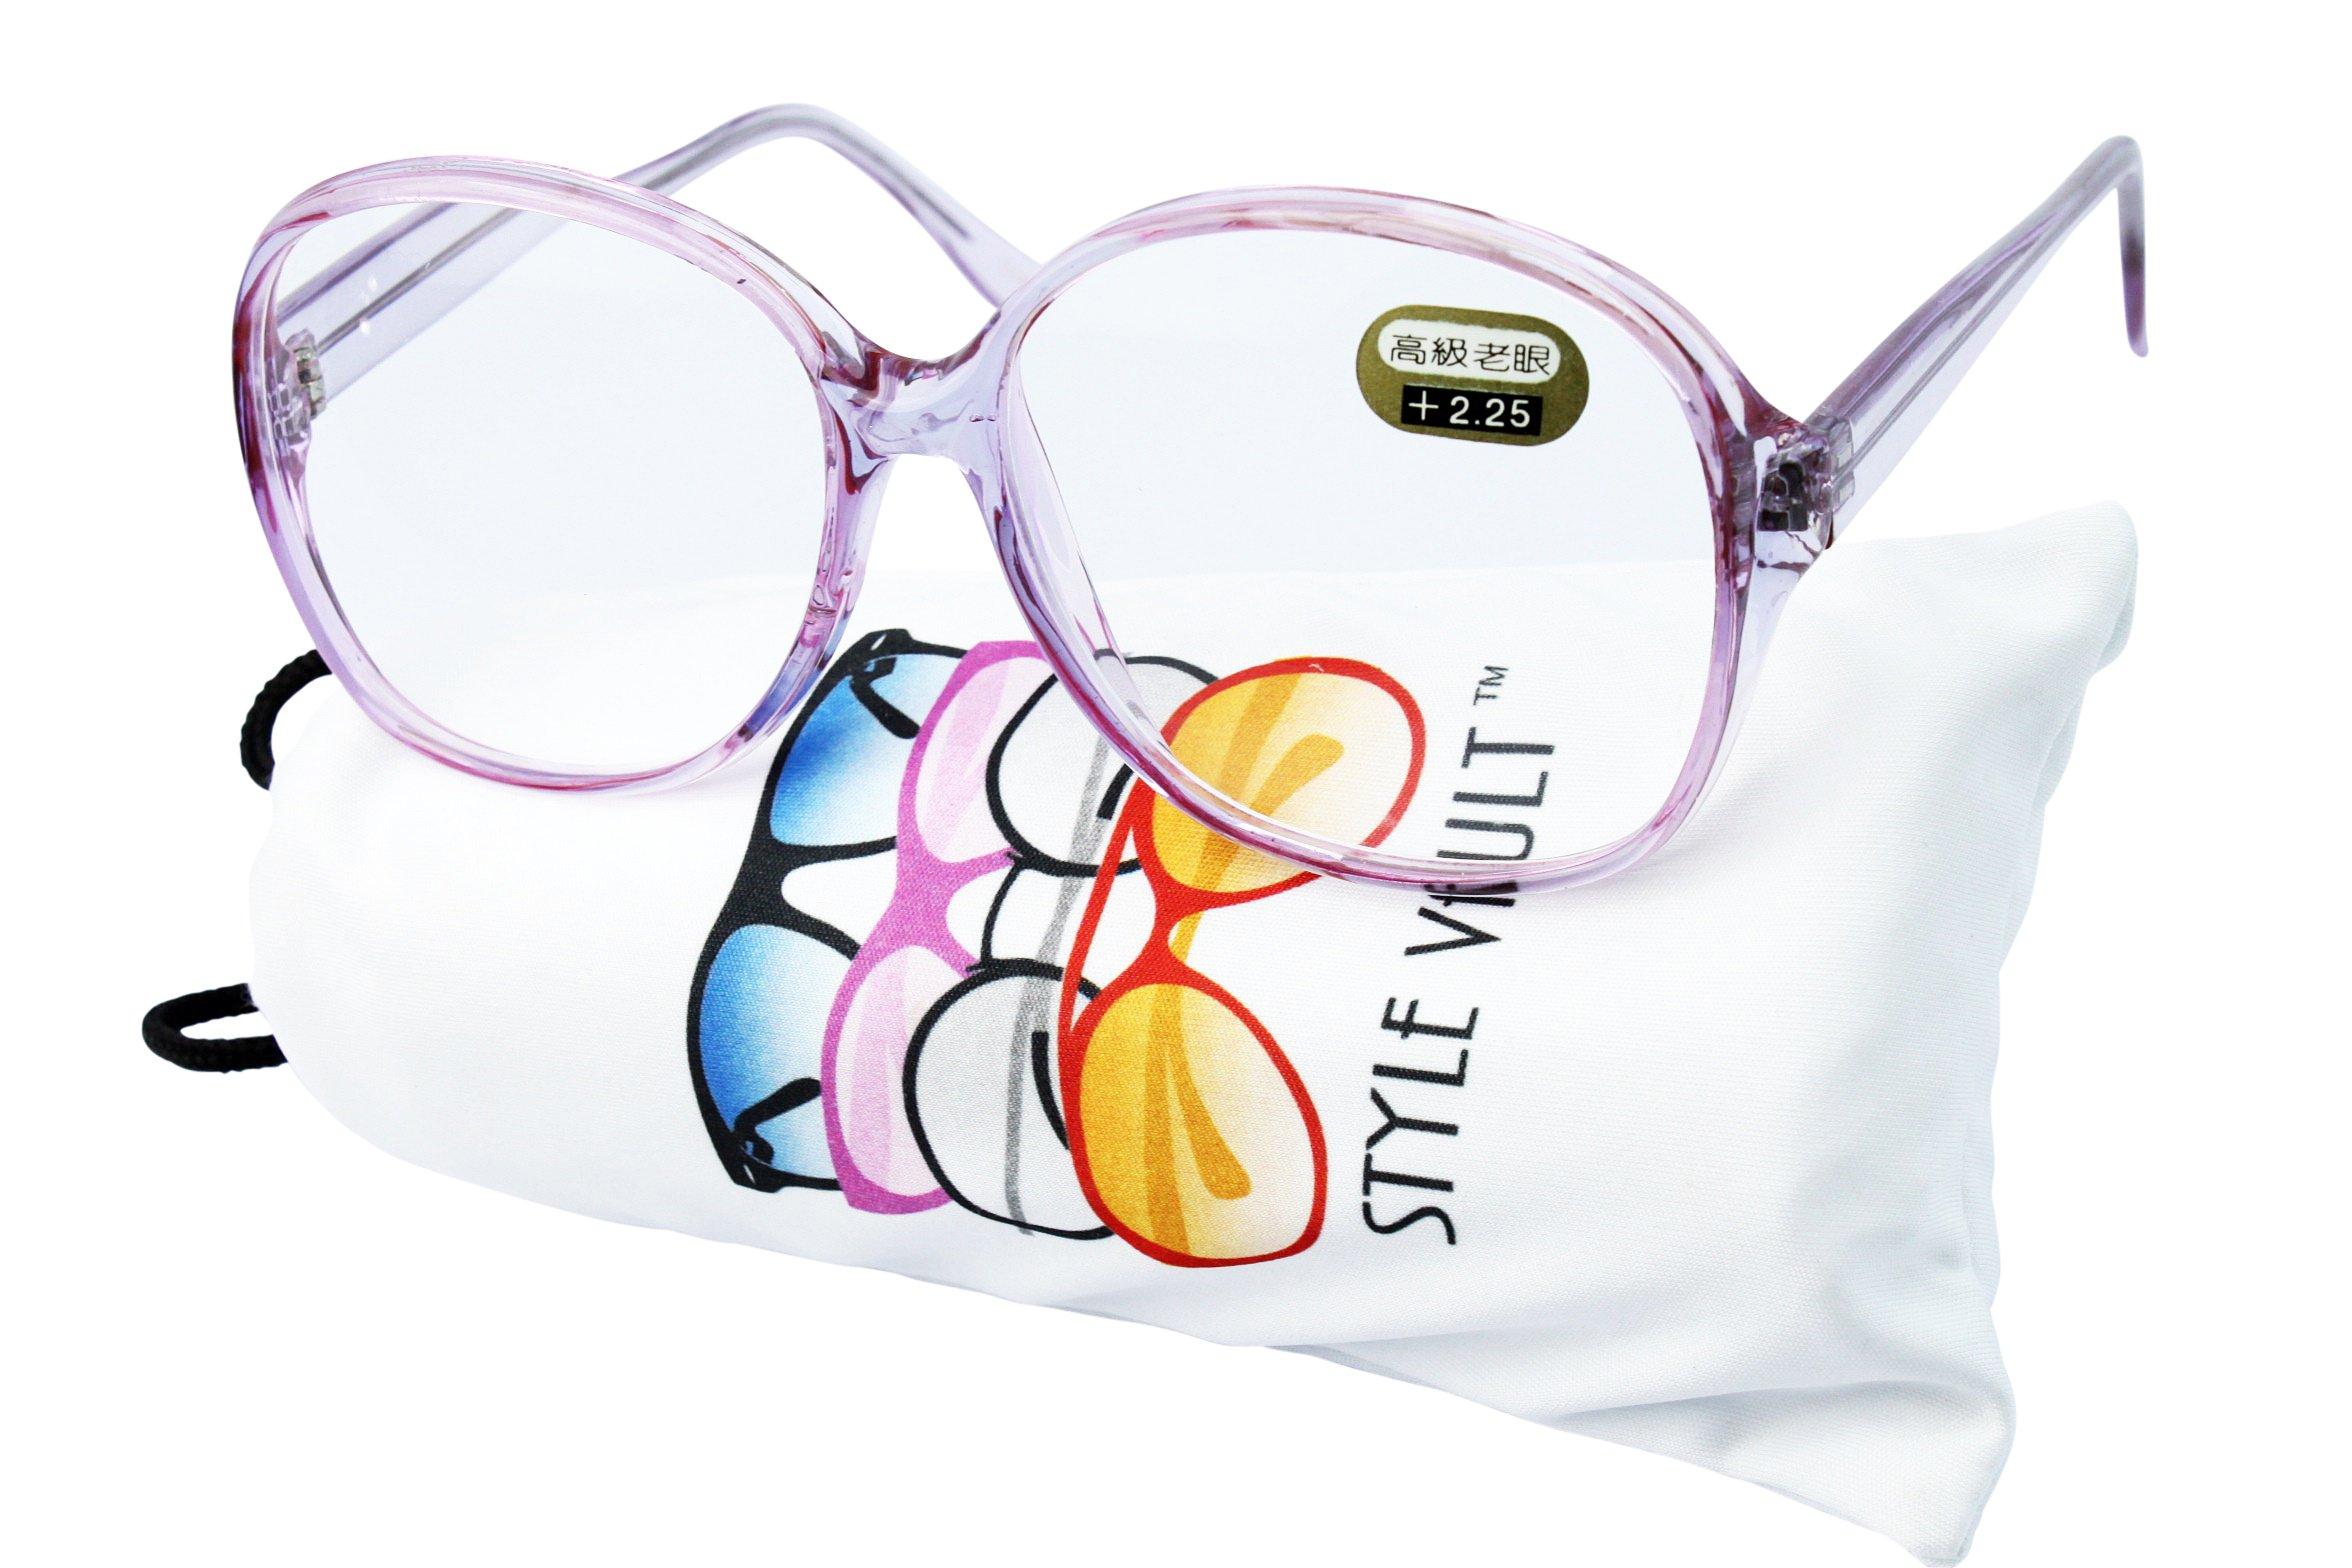 E3035-vp Style Vault Oversized Reading Eyeglasses (B1867F +2.25 Crystal purple)